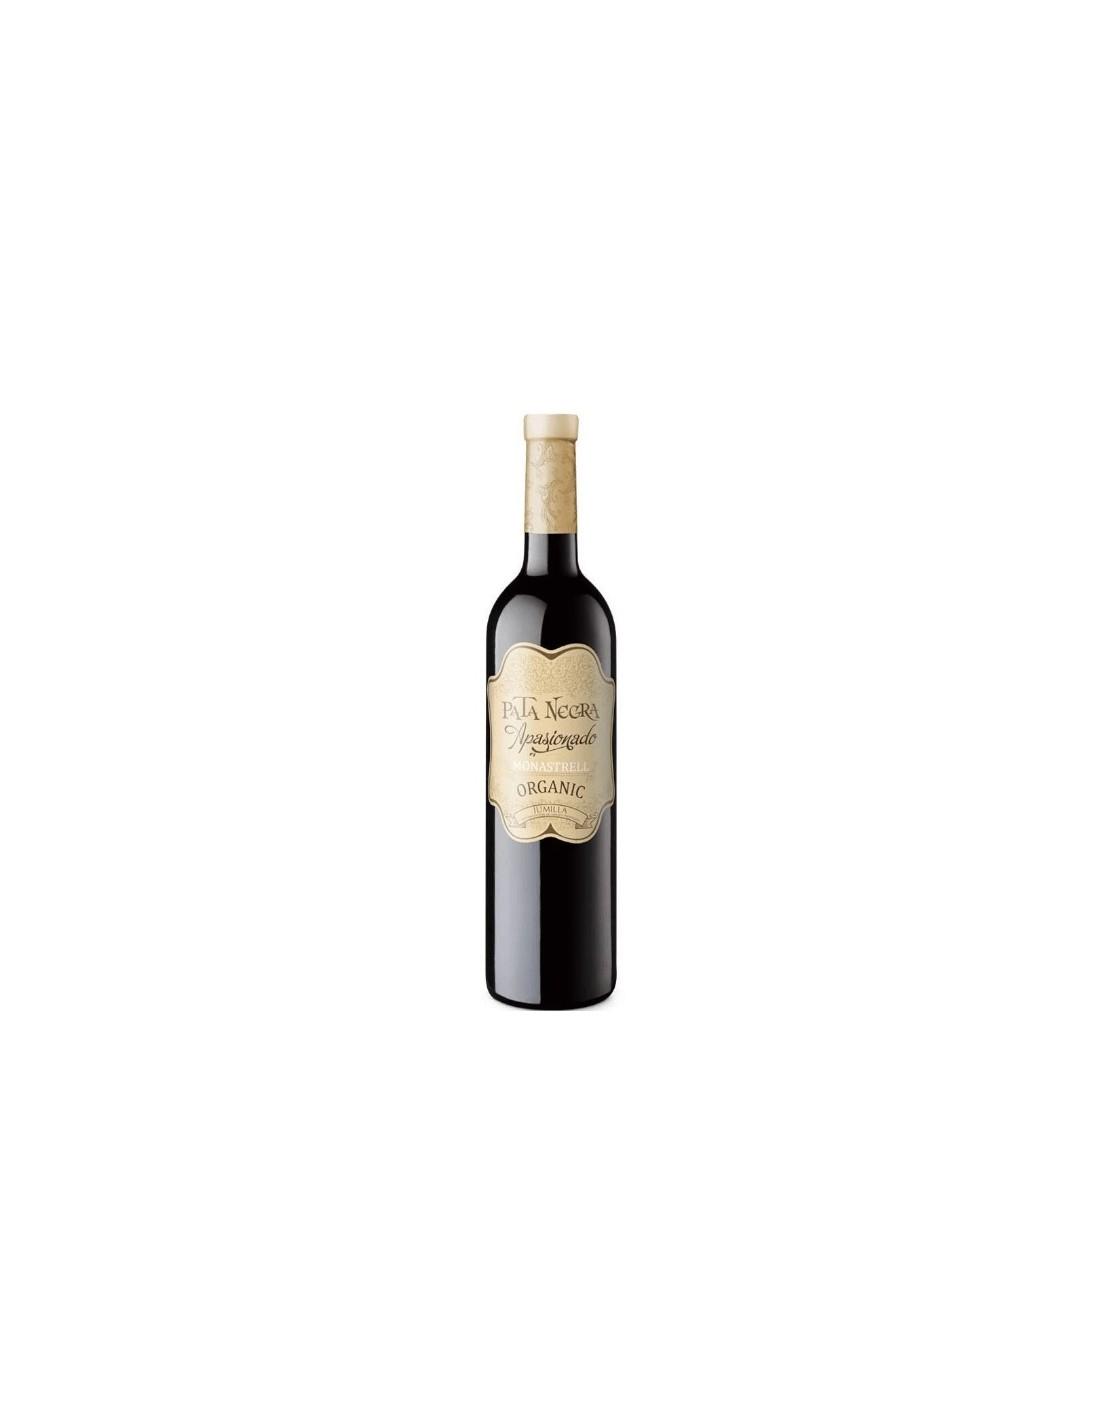 Vin rosu, Monastrell, Pata Negra Apasionado Organic Jumilla, 14.5% alc., 0.75L, Spania